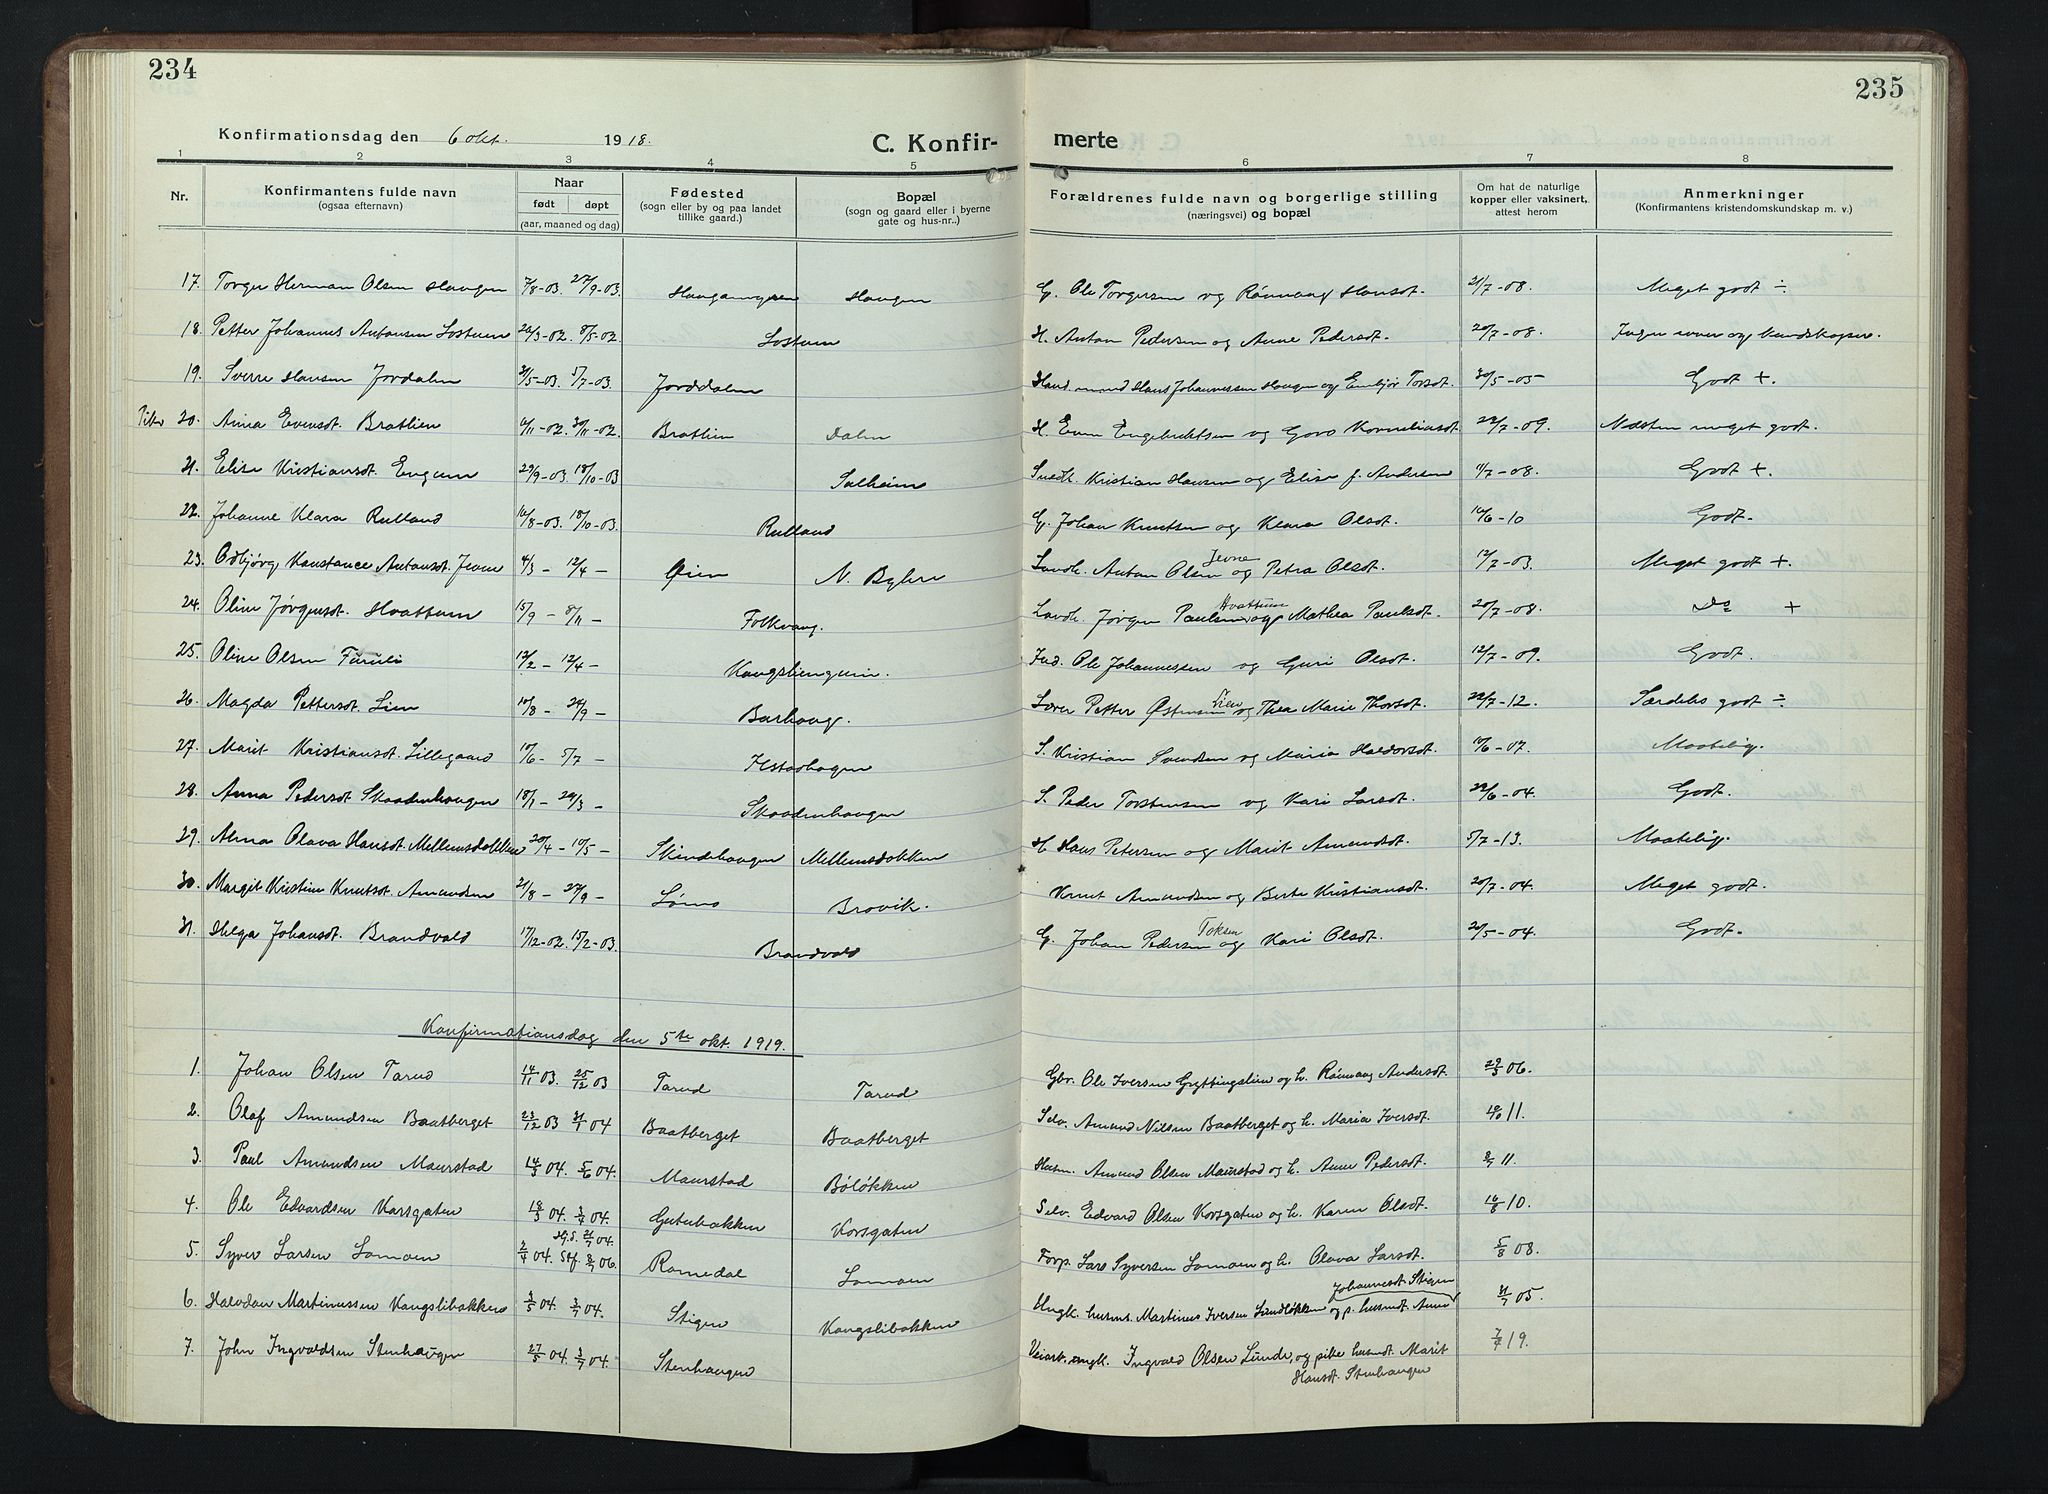 SAH, Nord-Fron prestekontor, Klokkerbok nr. 7, 1915-1946, s. 234-235